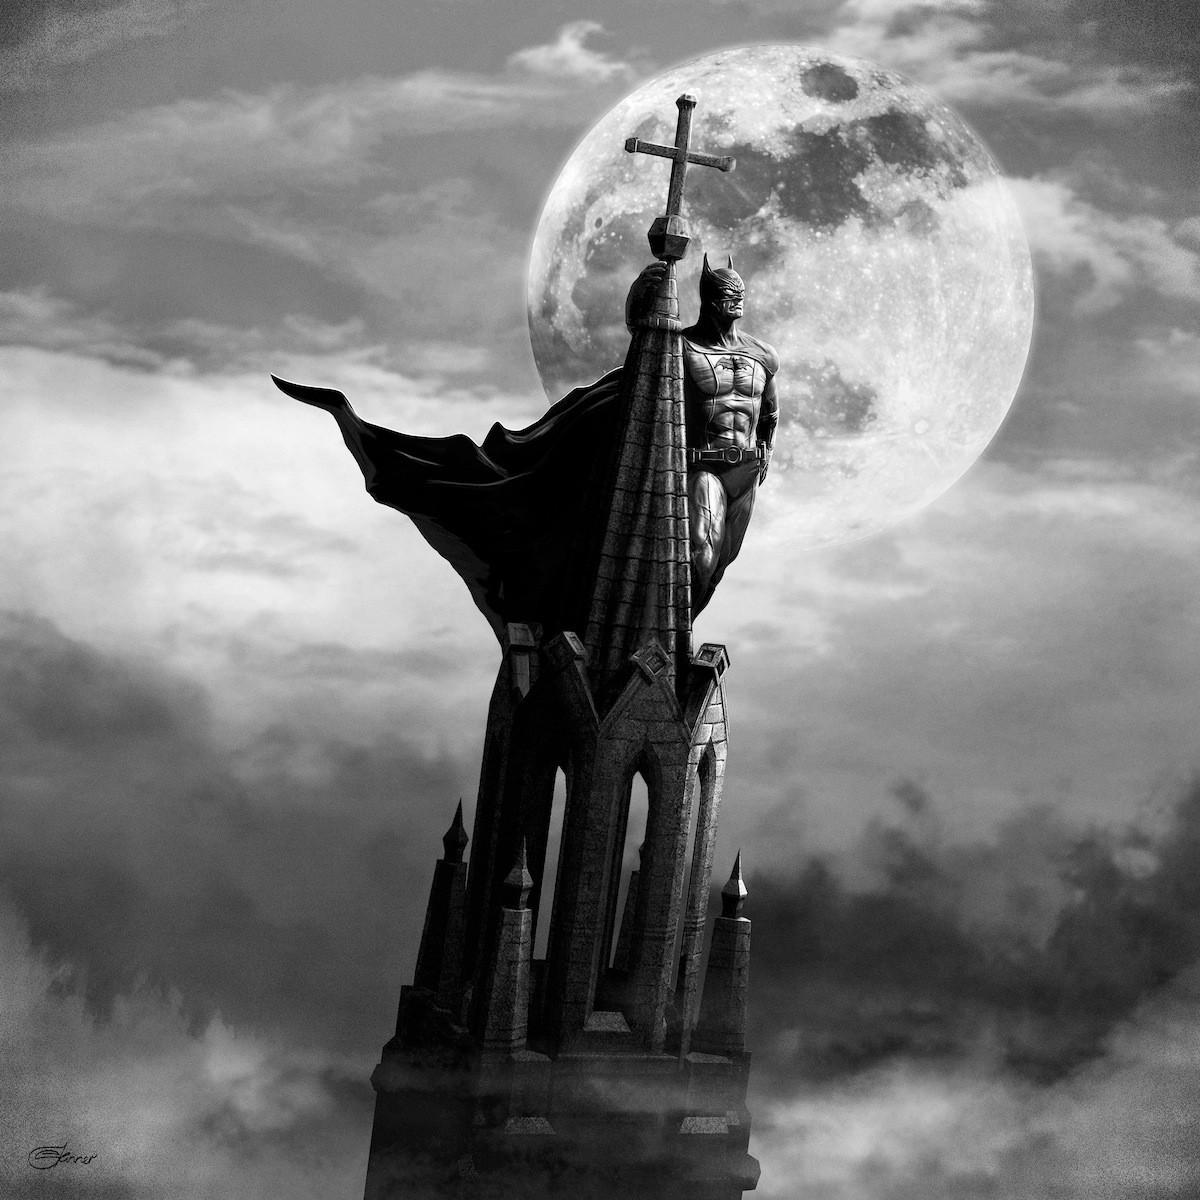 Chris-Skinner-In-Darkest-Knight.png (1200×1200)